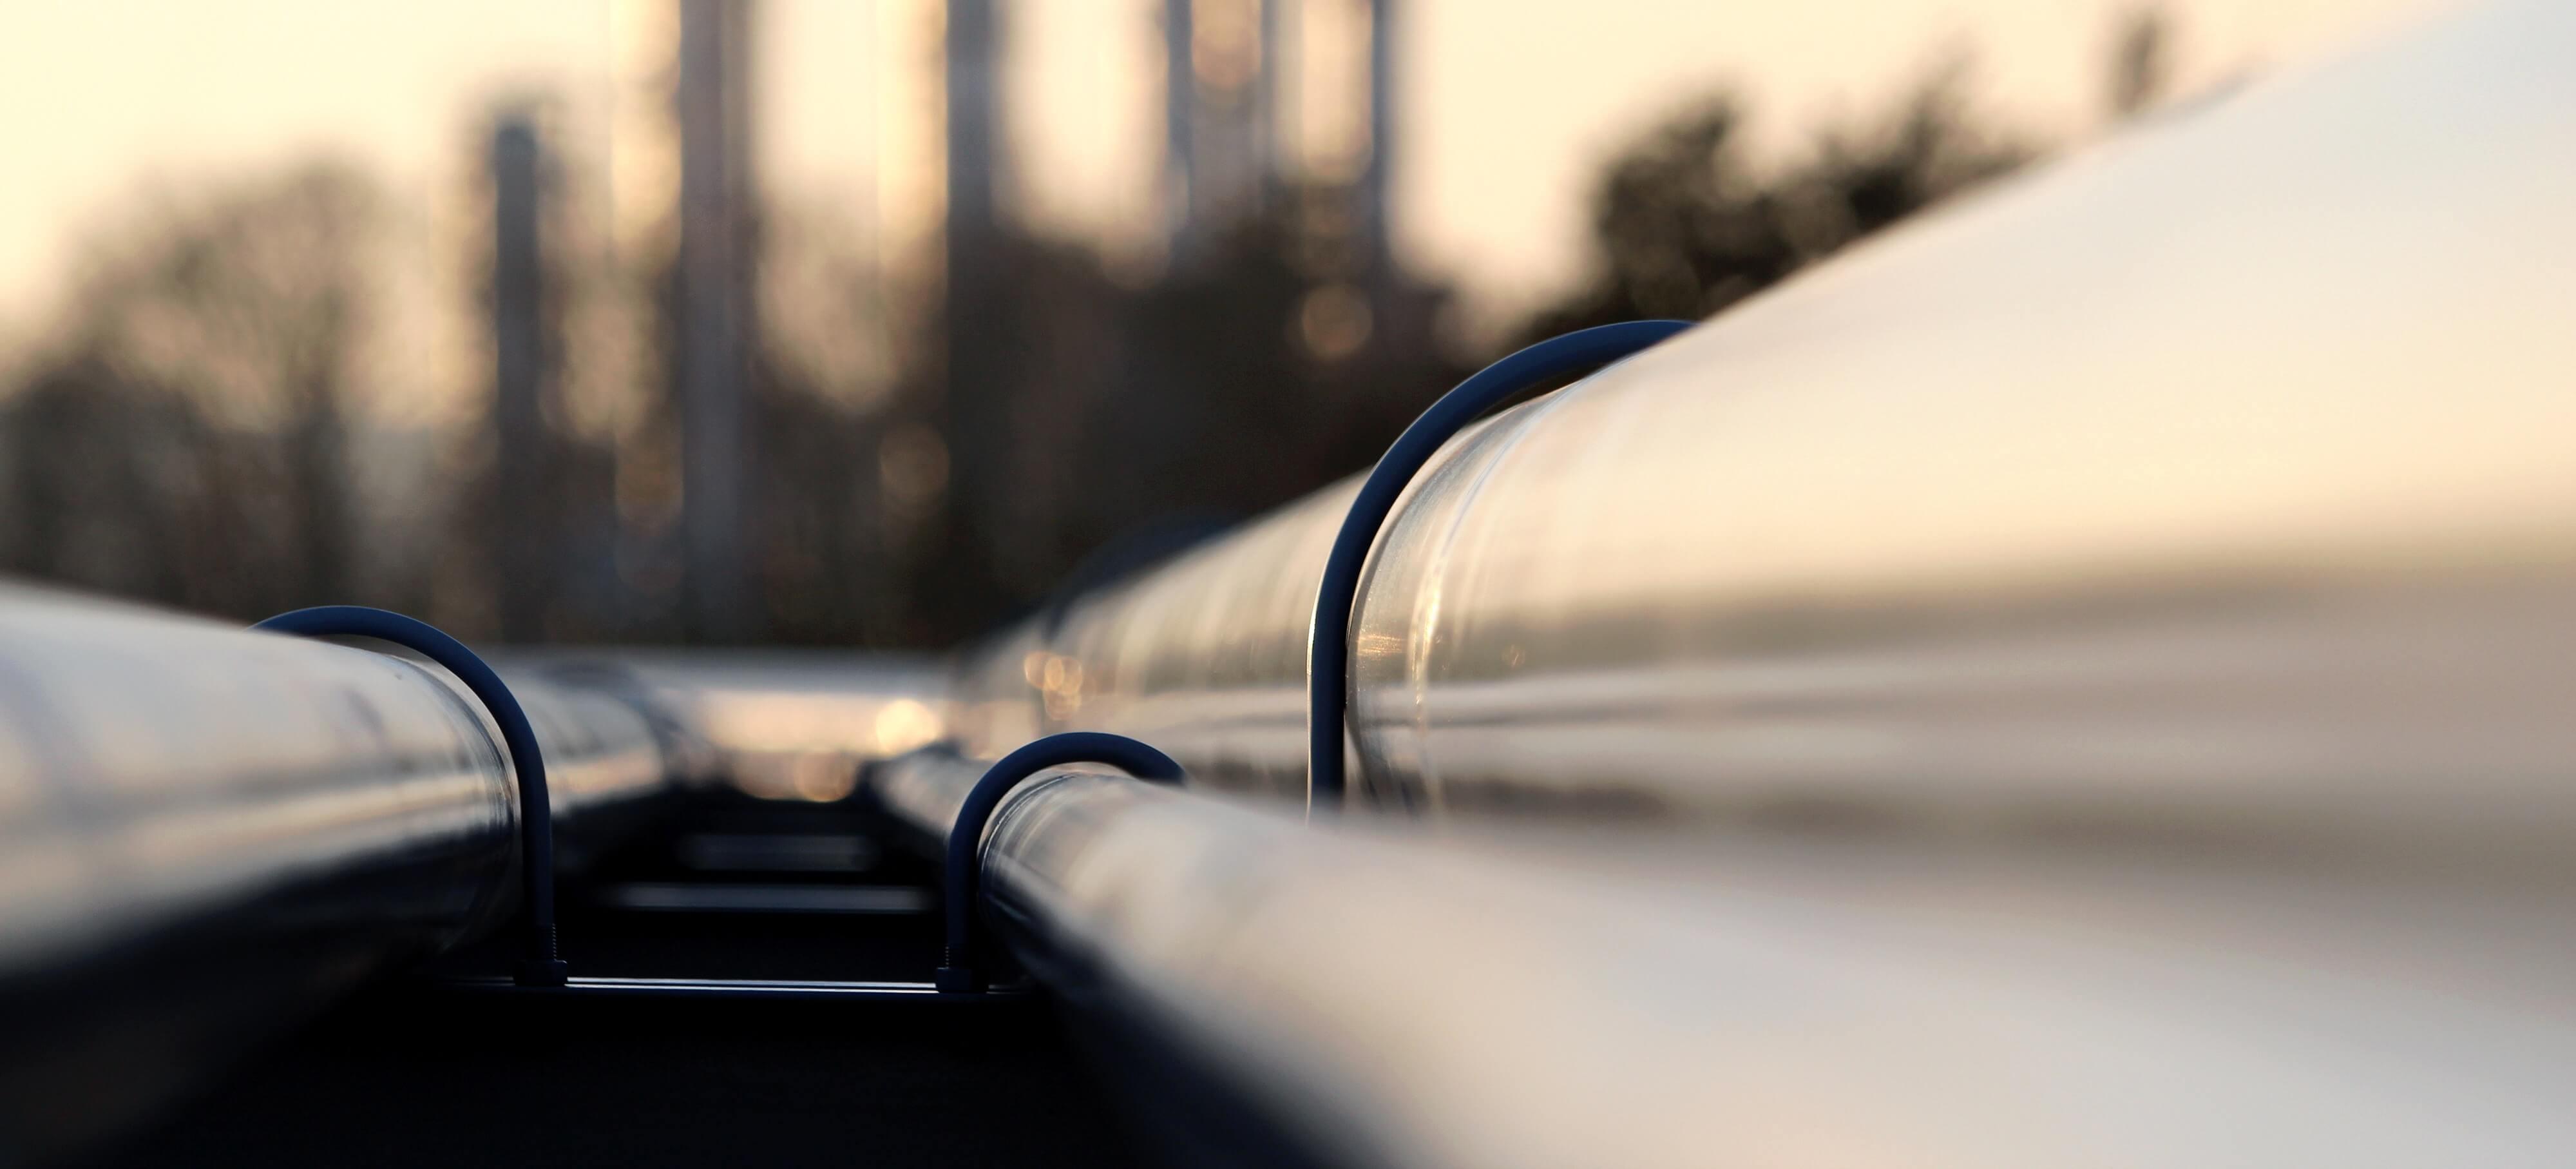 Nitrogen Pipeline Purging